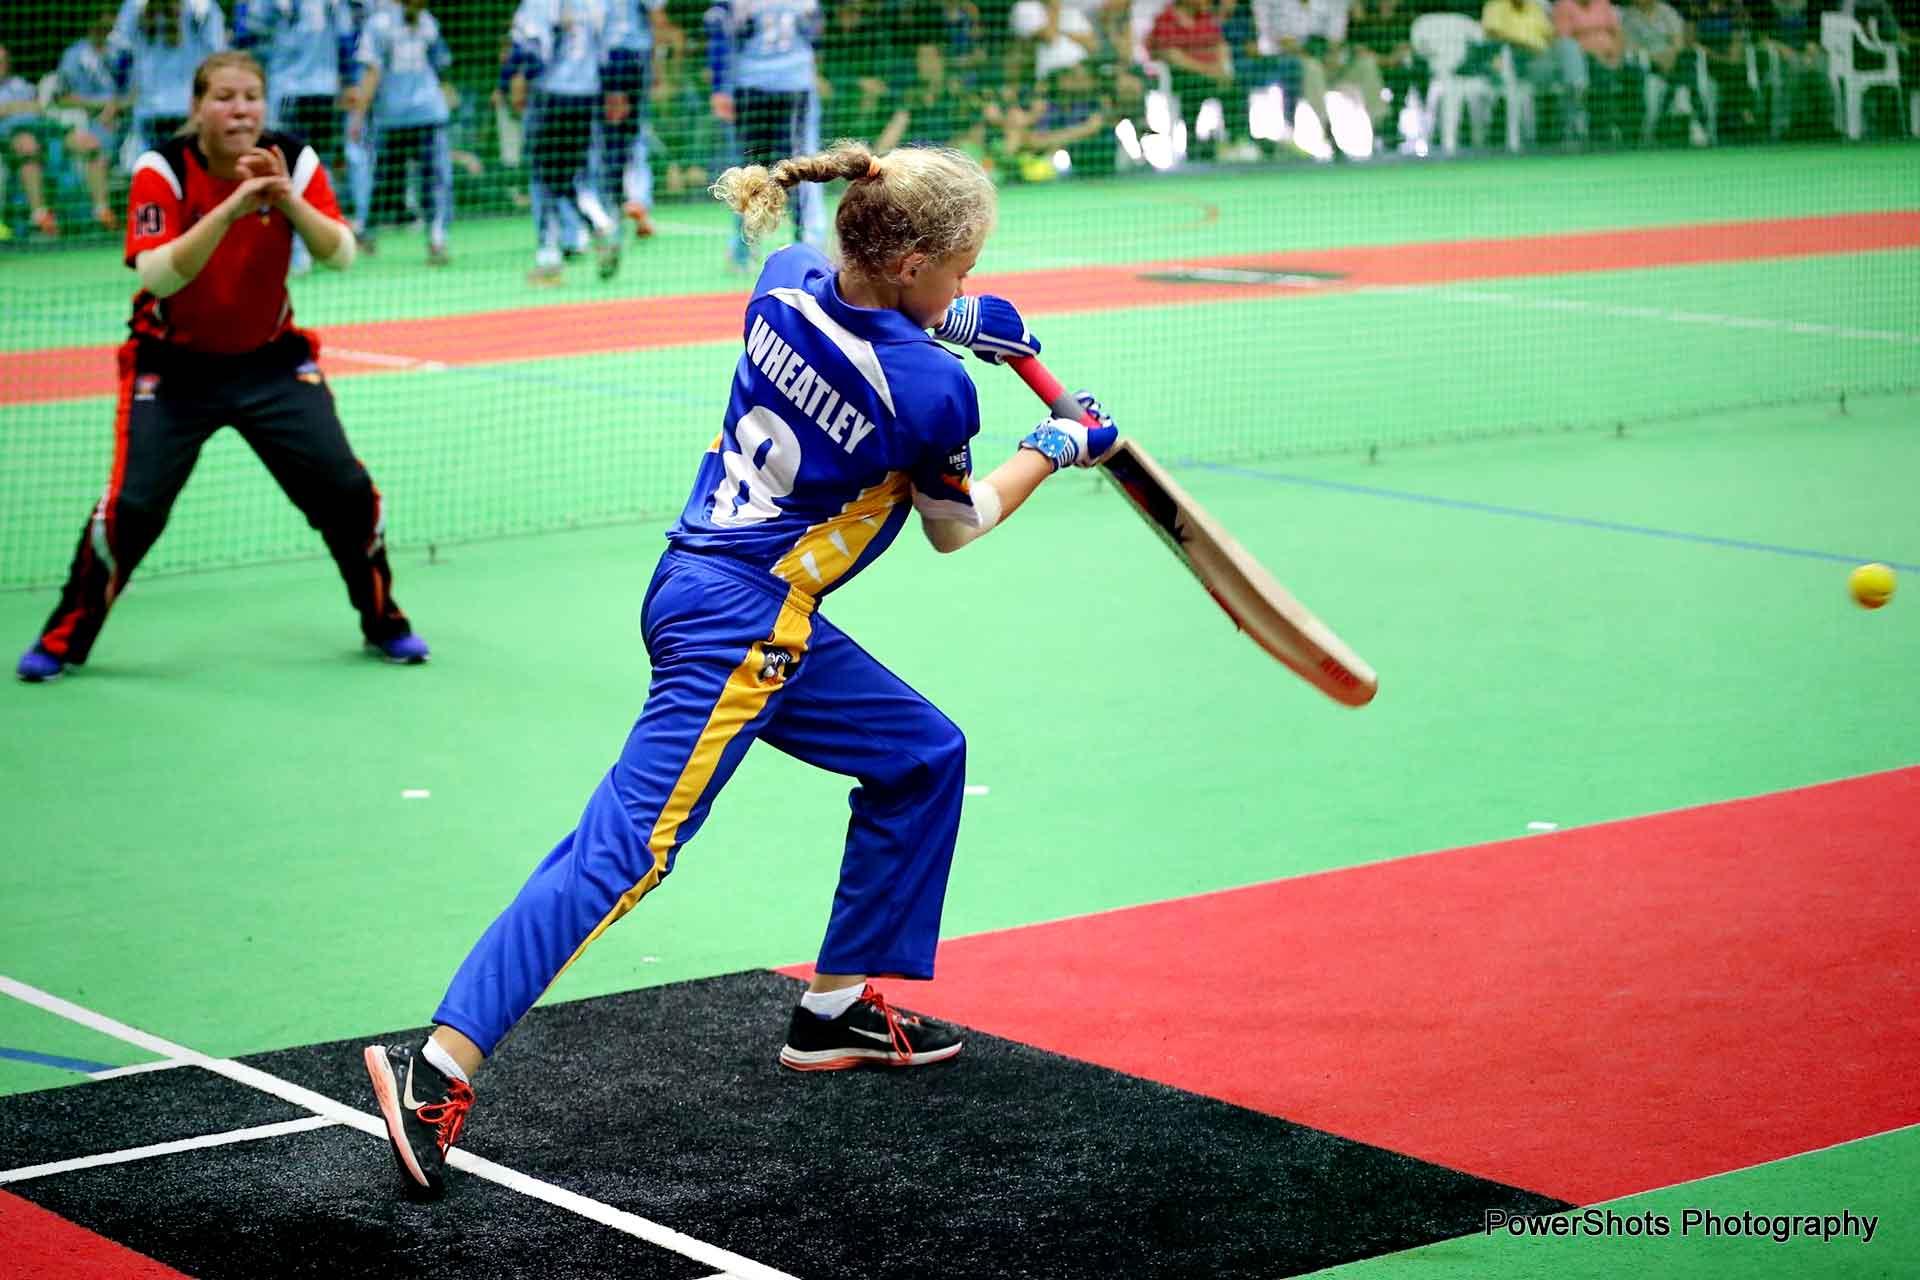 Future stars to contest indoor nationals